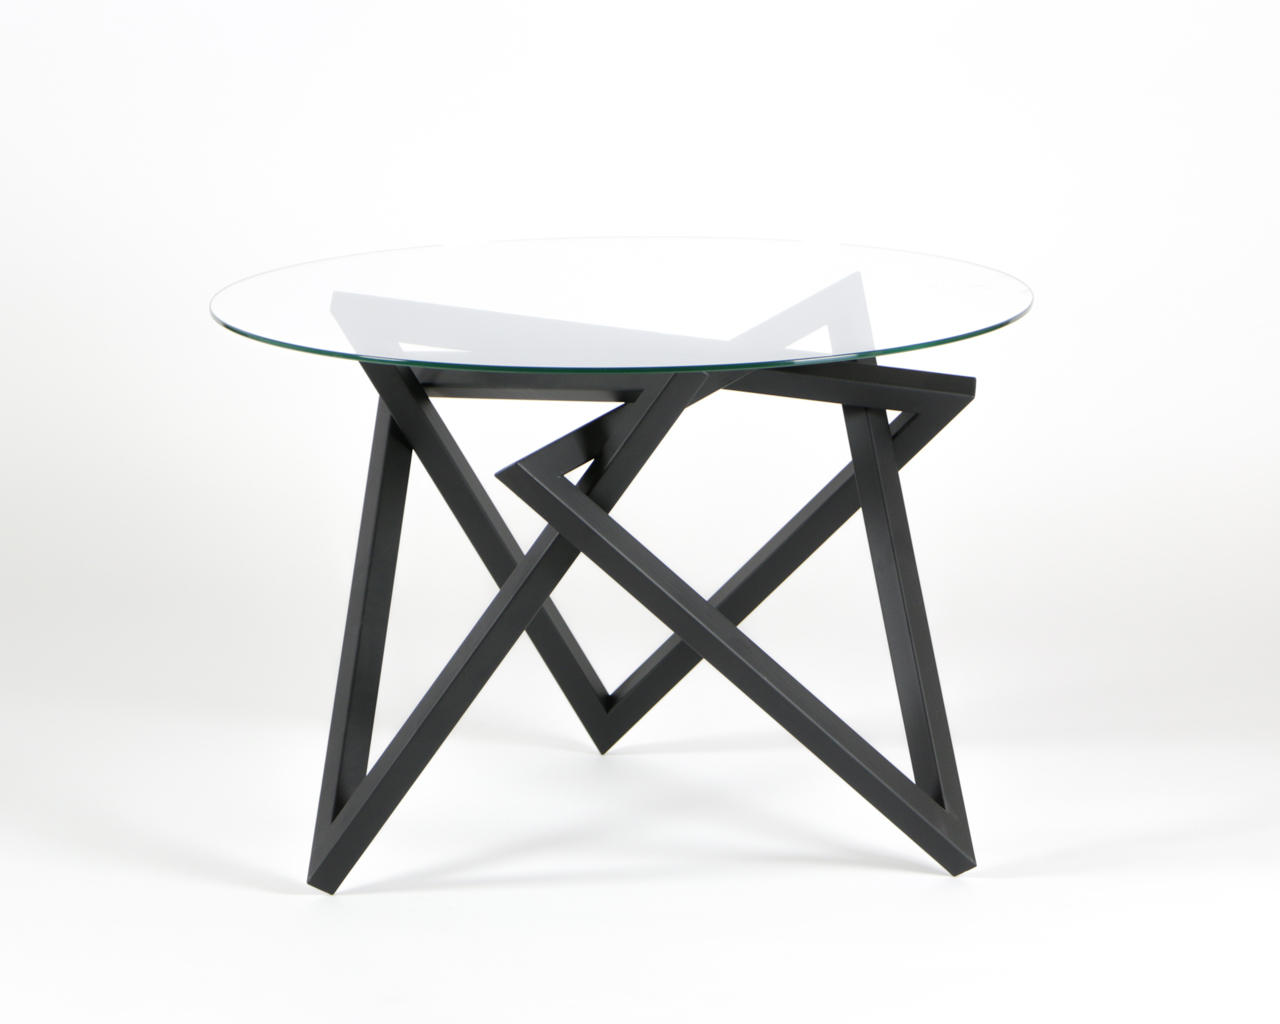 Tangle Table by Liam Mugavin